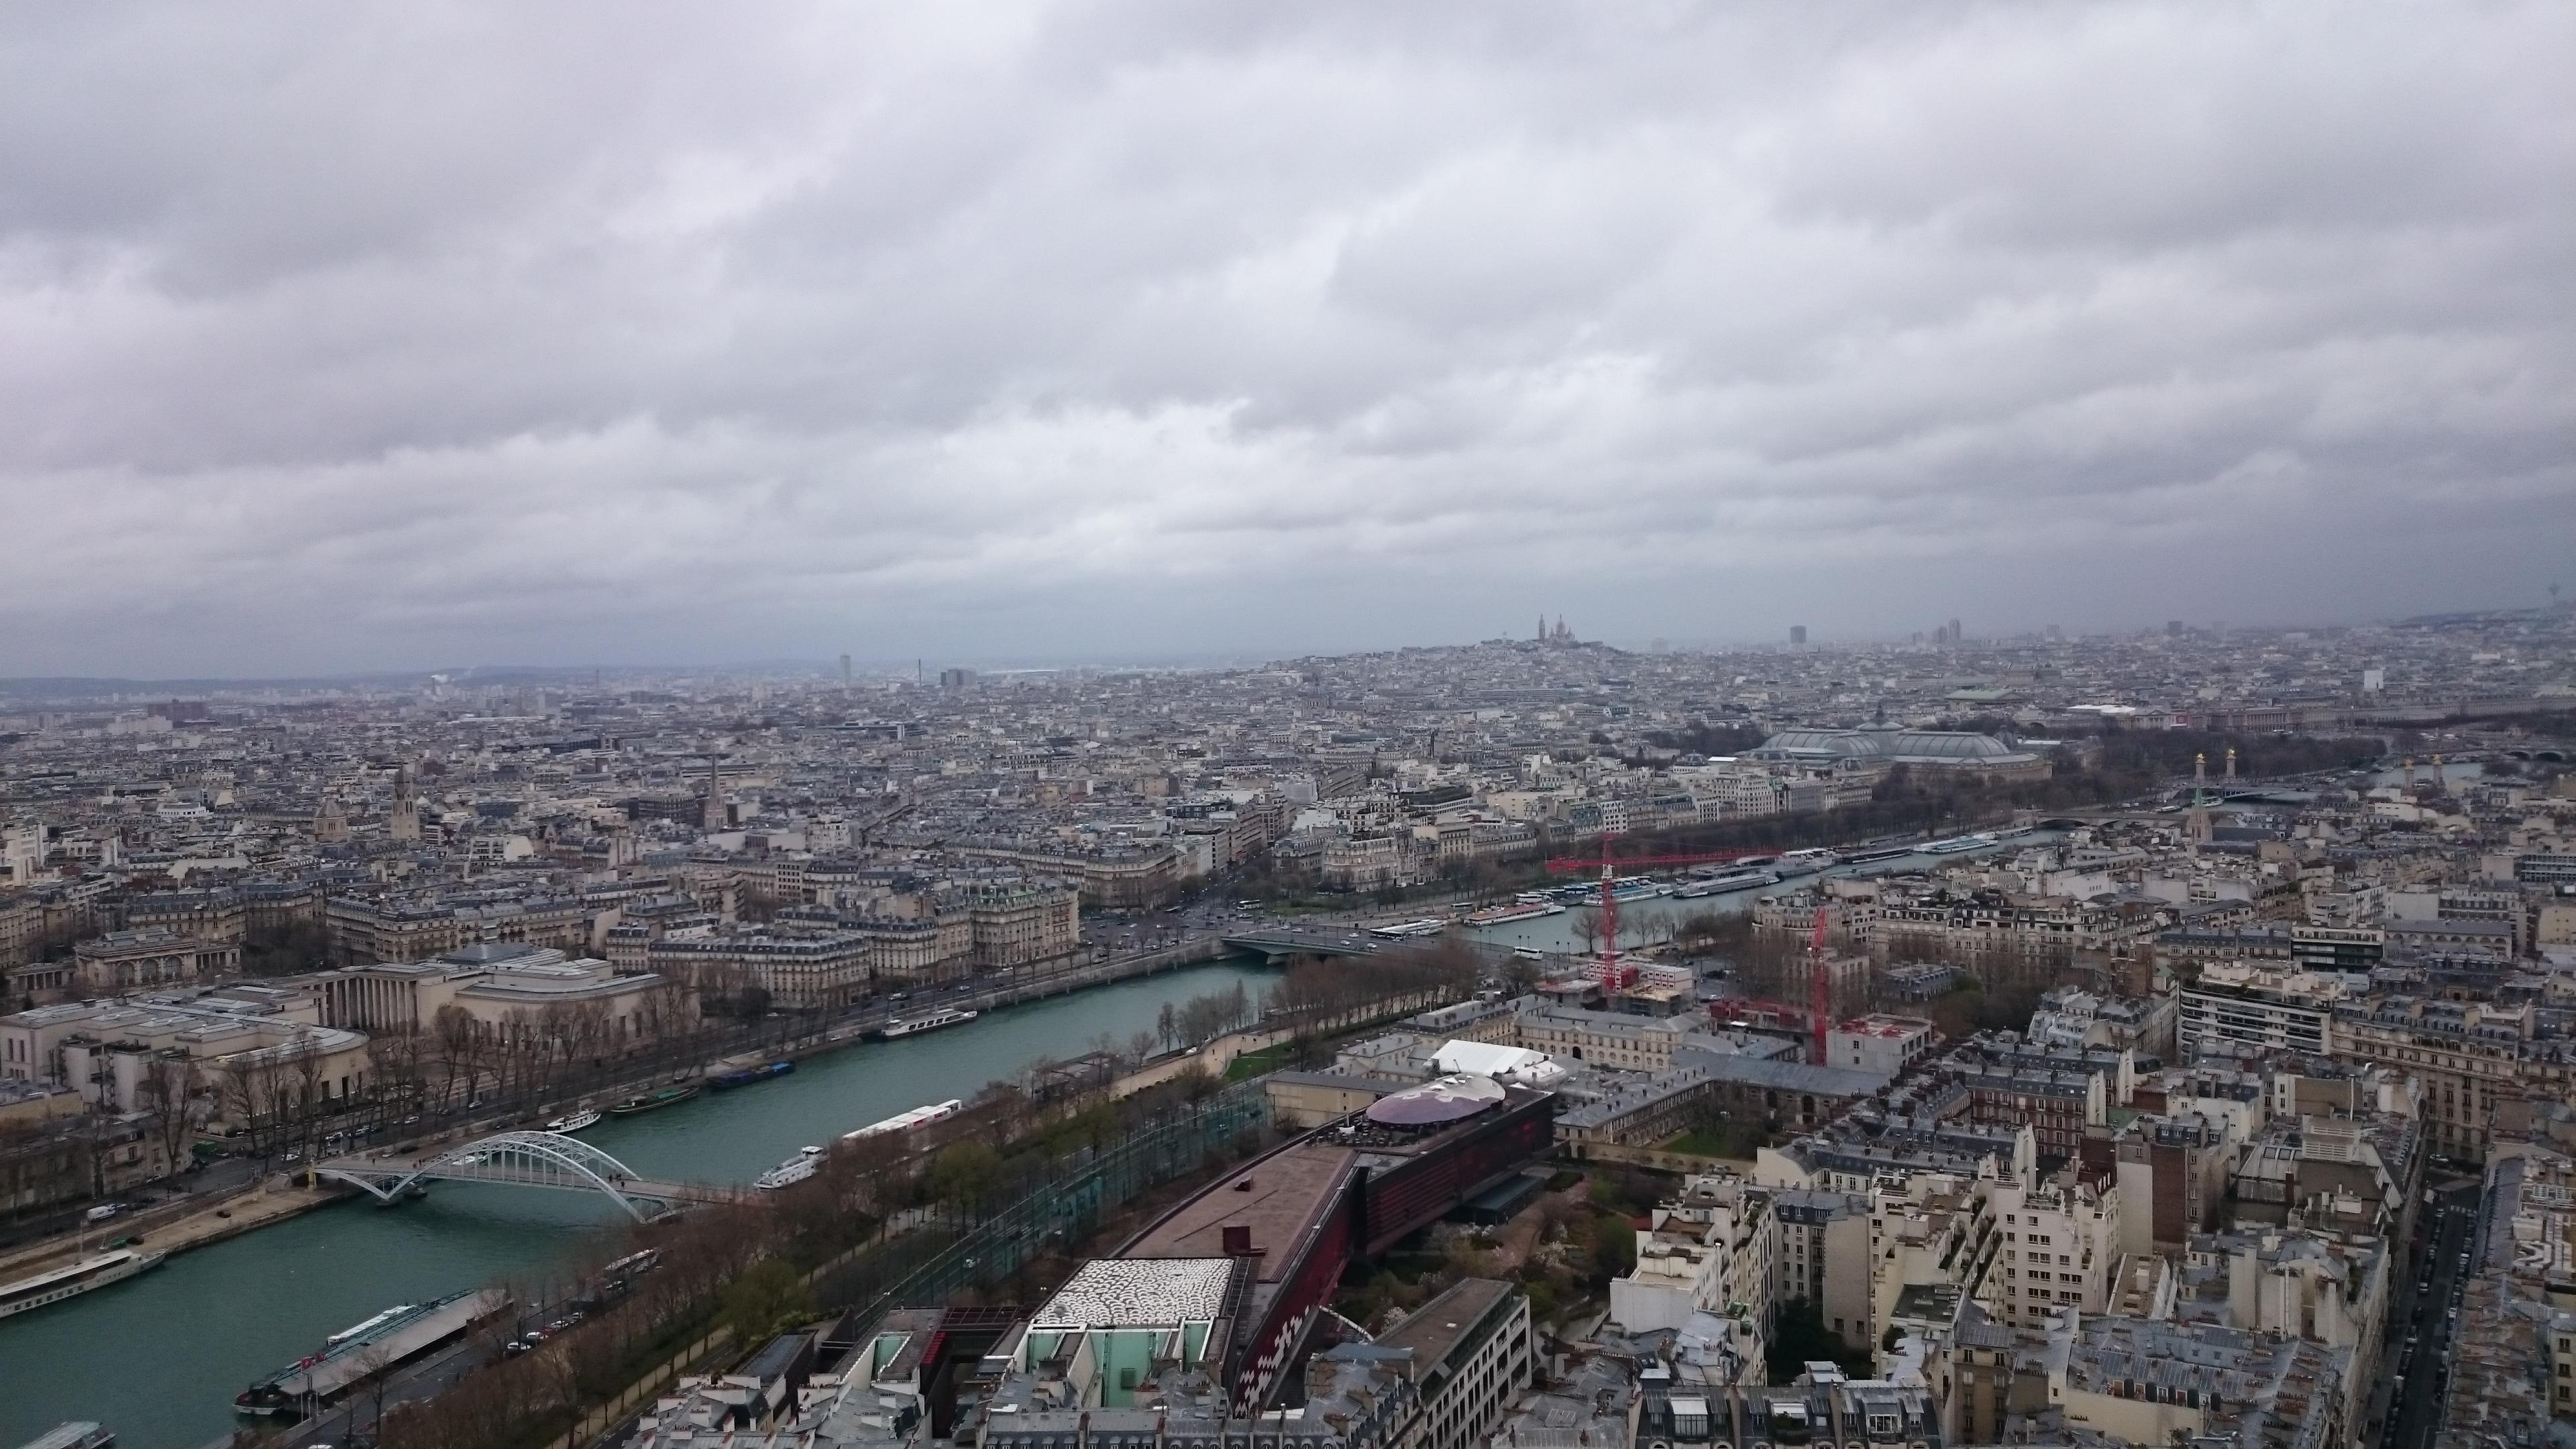 DSC 1940 - Visitando la Torre Eiffel en Paris